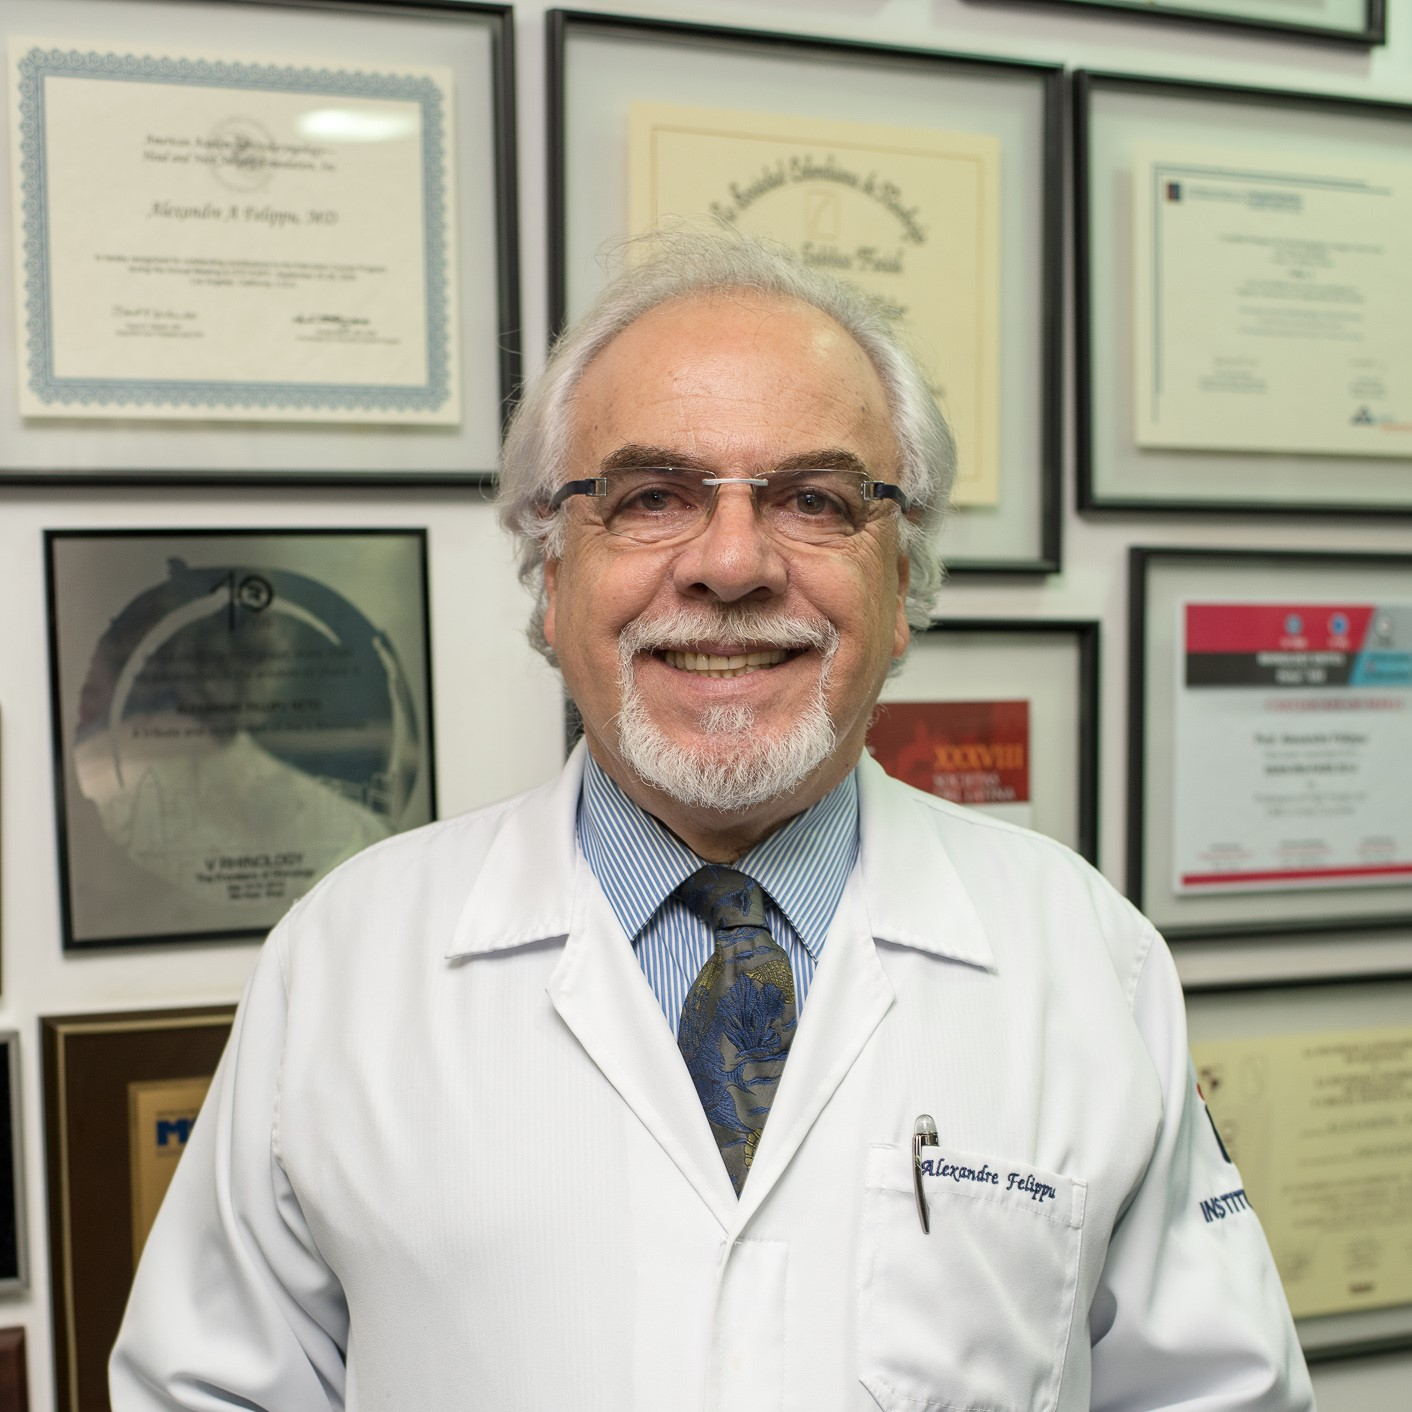 Prof. Dr. Alexandre Felippu Neto